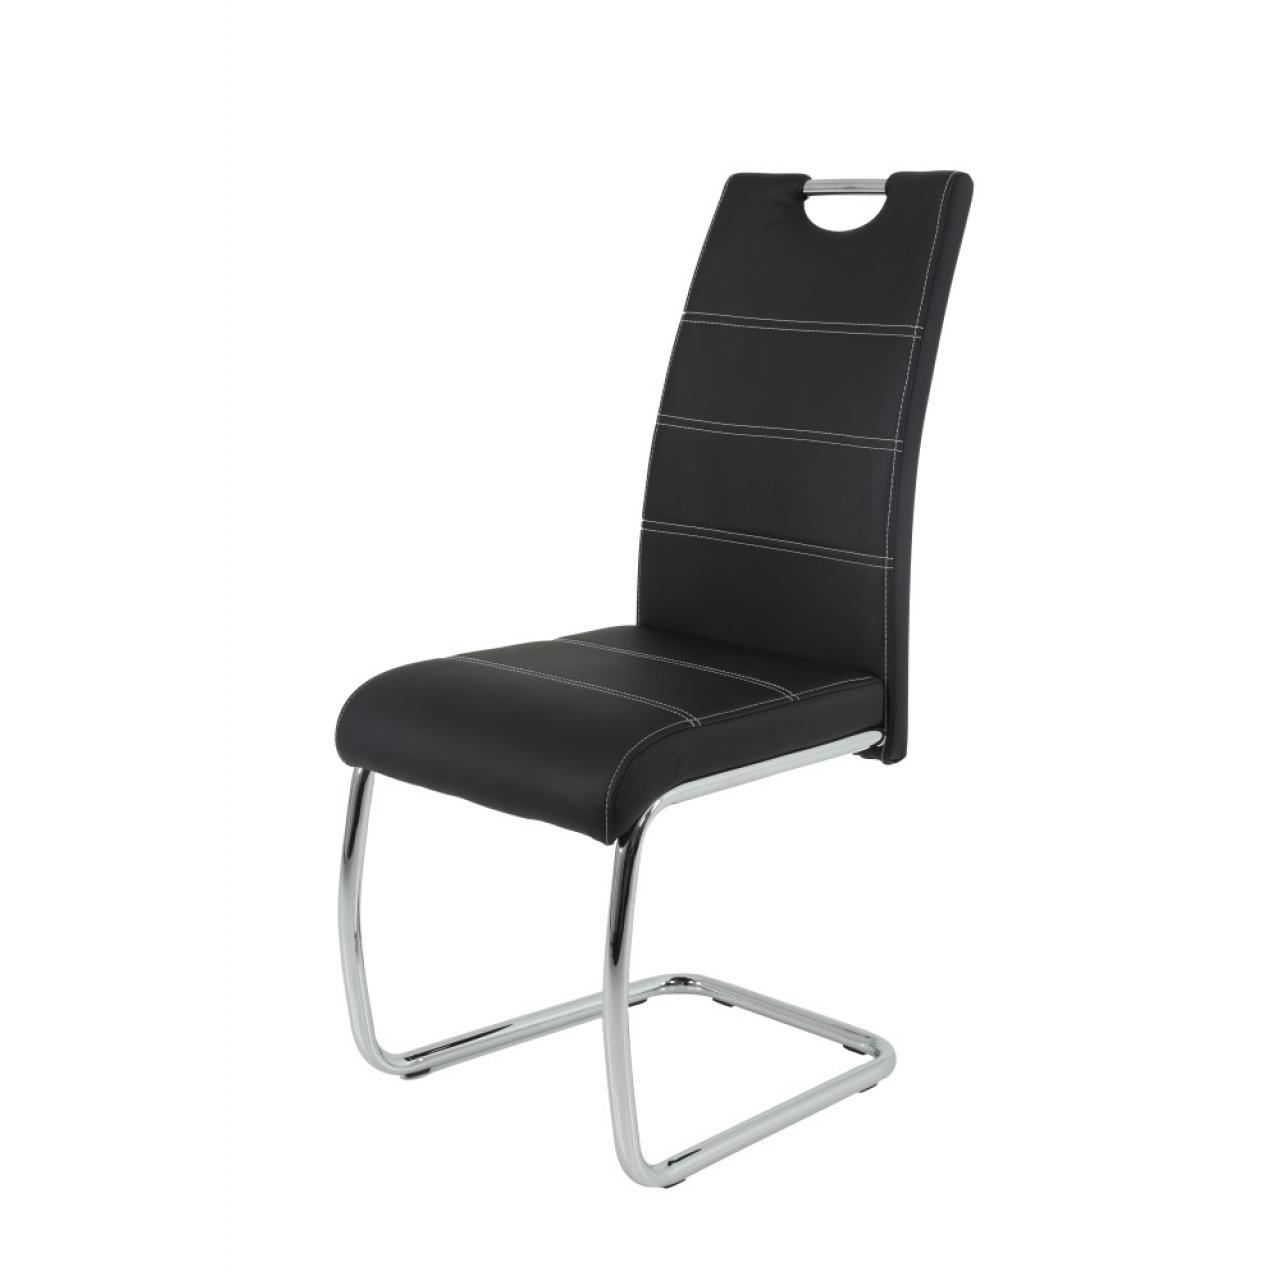 Stuhl Flora II S Esszimmerstuhl Küchenstuhl Stoff Vintage Optik Schwingstuhl